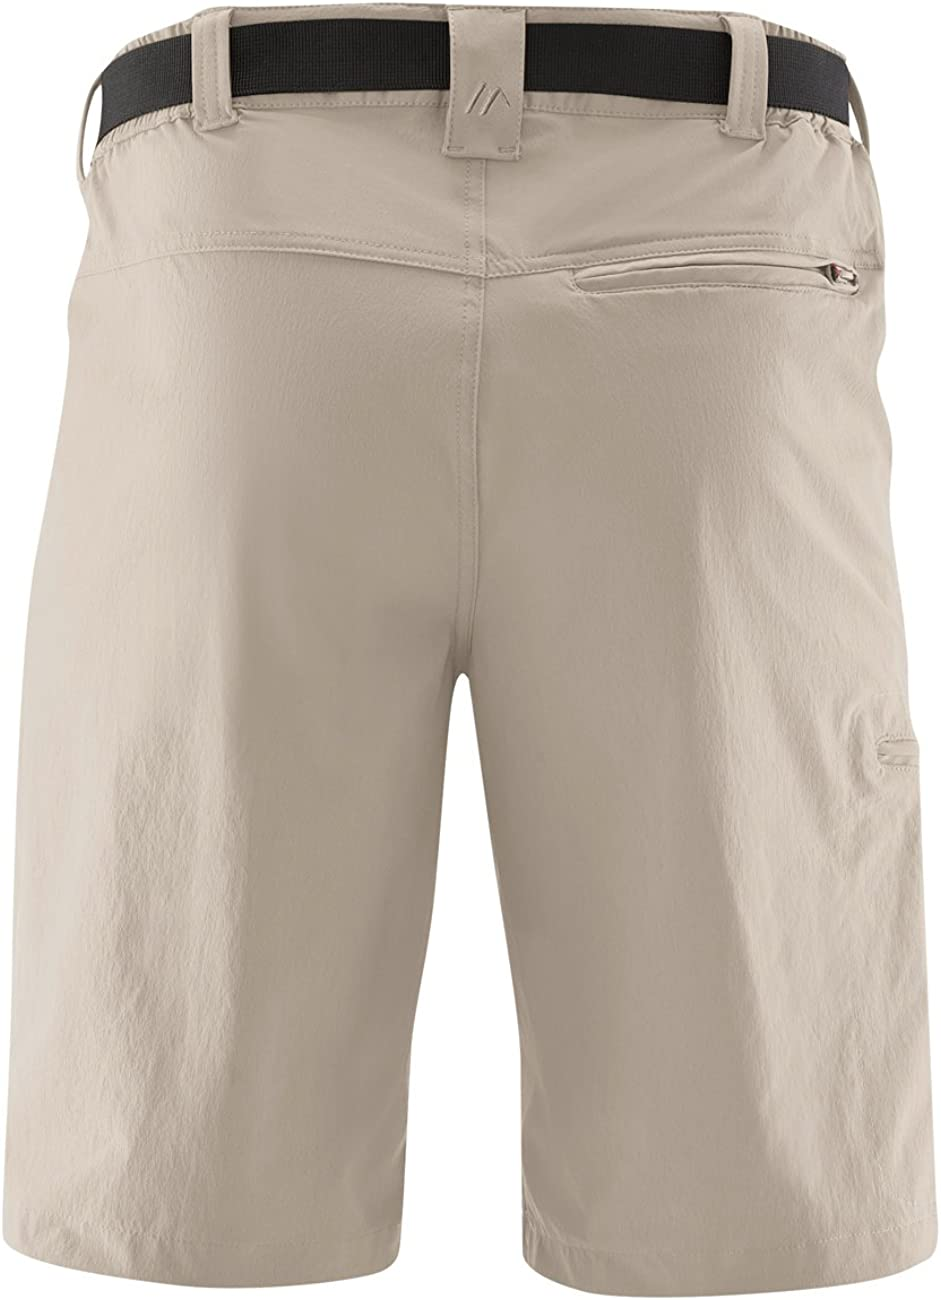 maier sports Bermuda Huang Pantalones Cortos Hombre